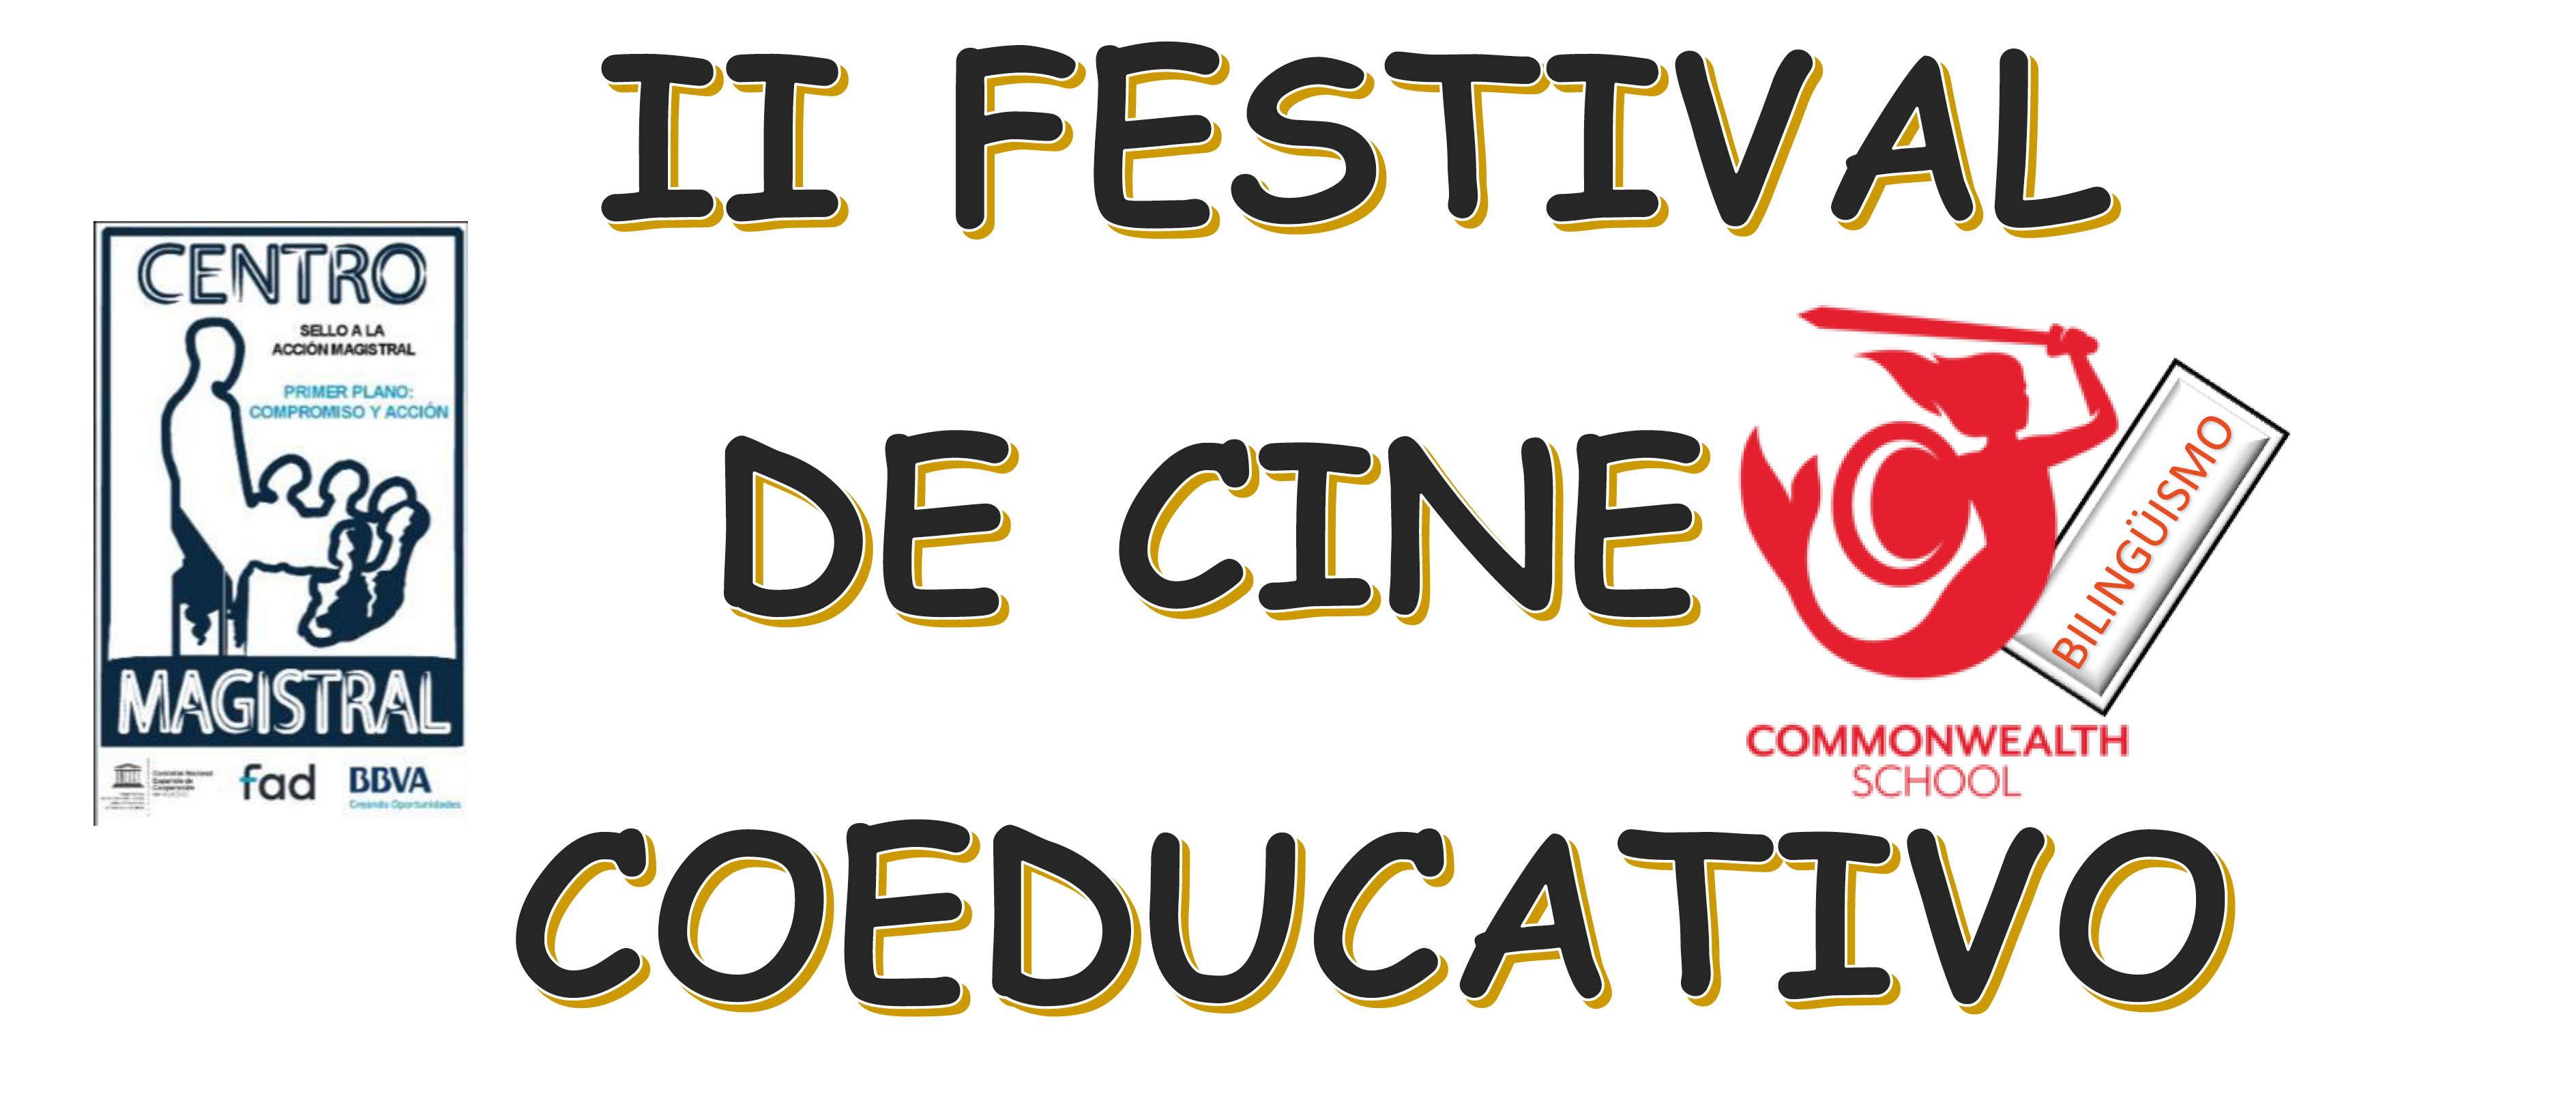 II Festival de Cine Coeducativo